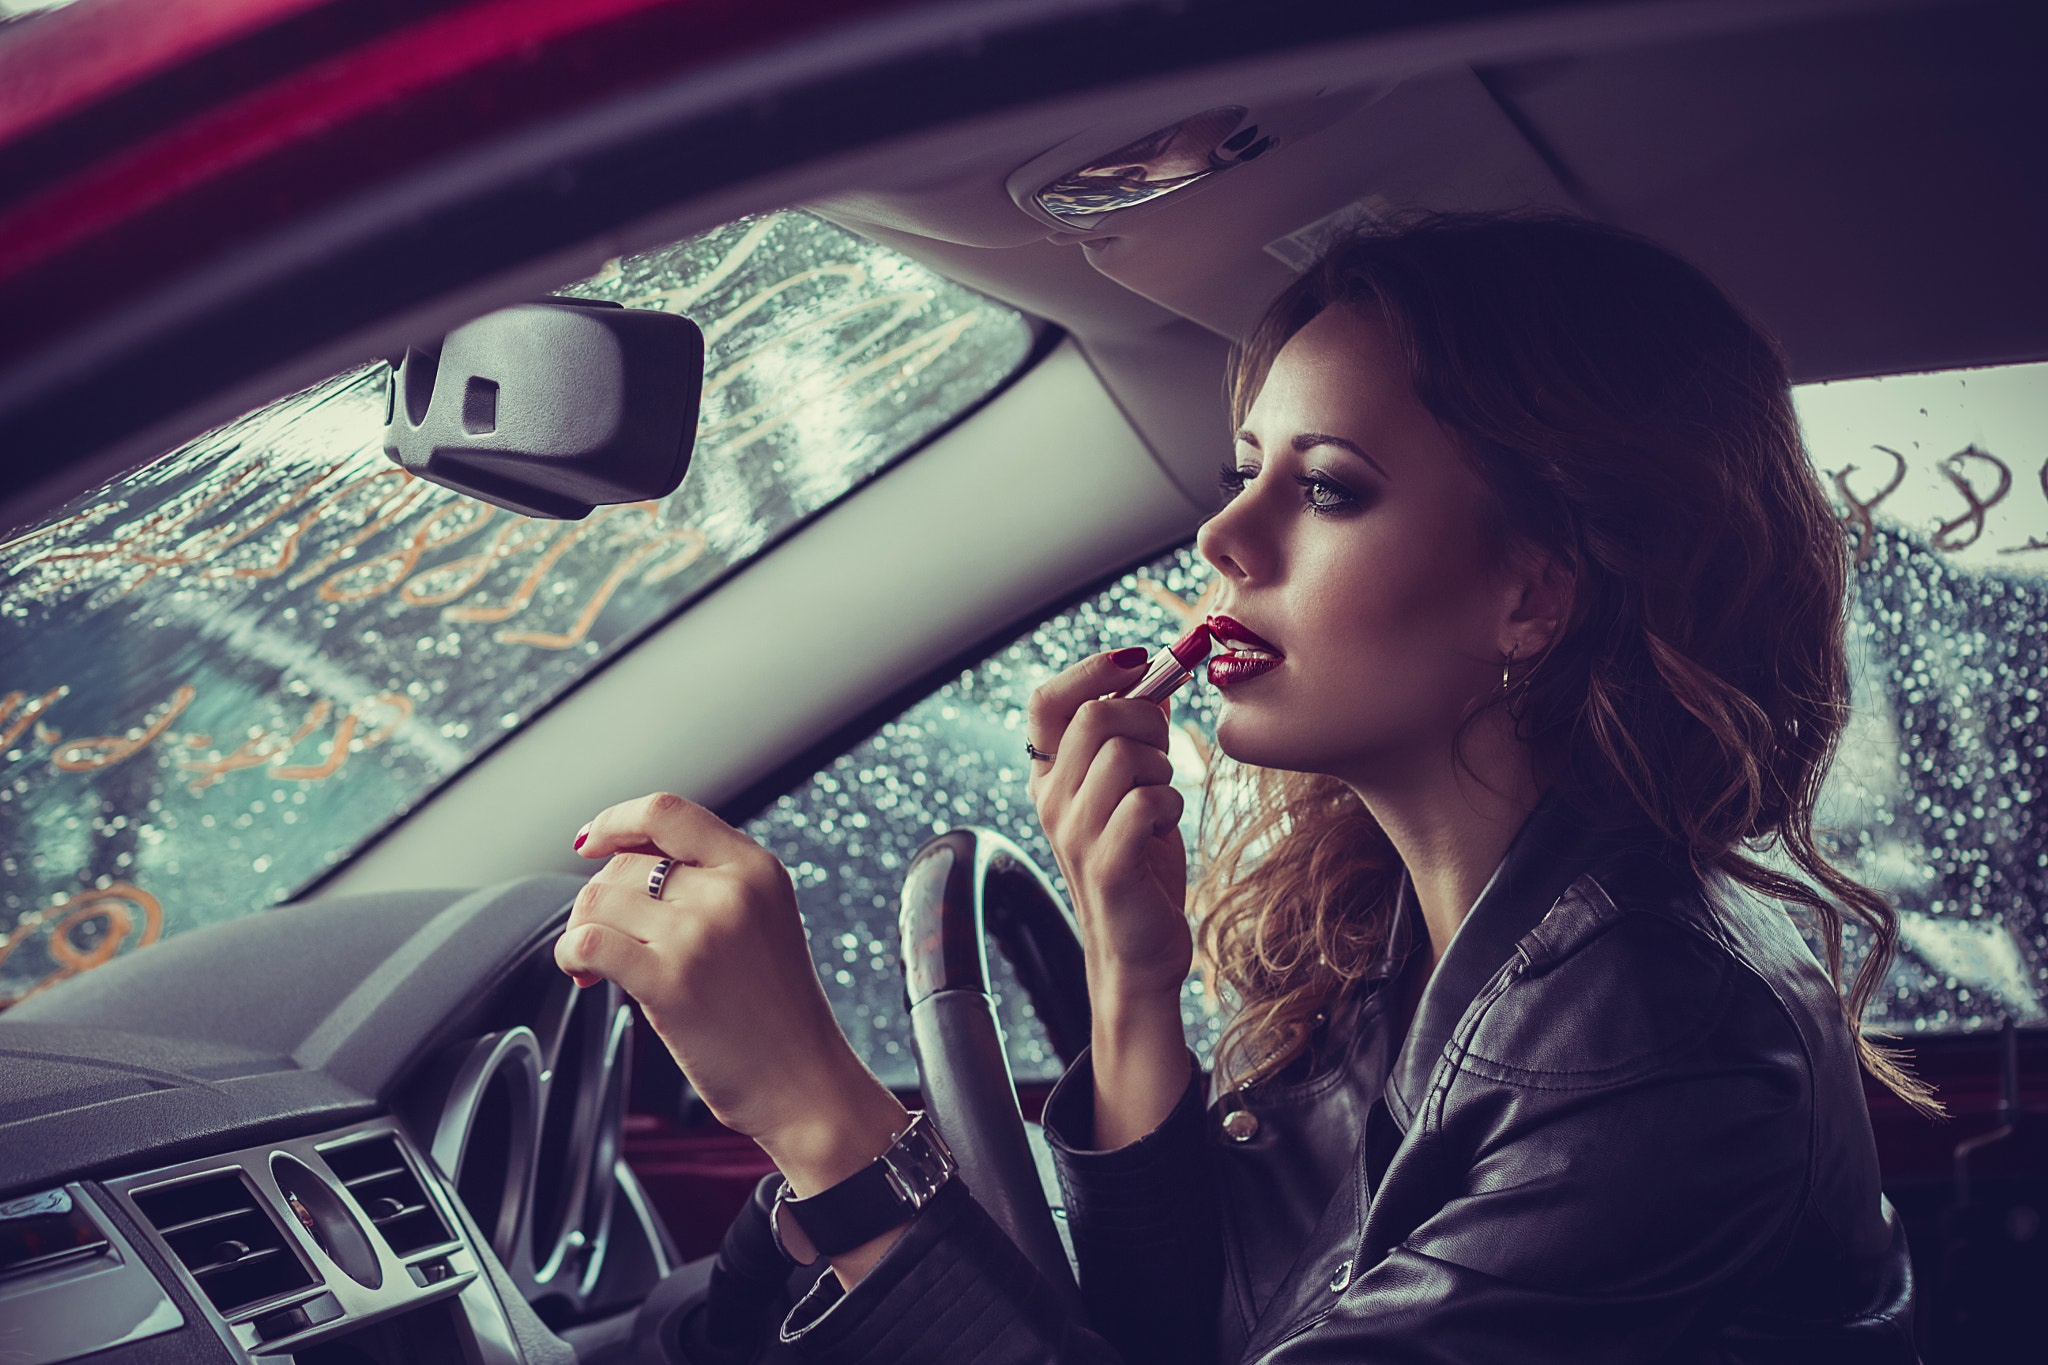 фото в машине девушки - 14